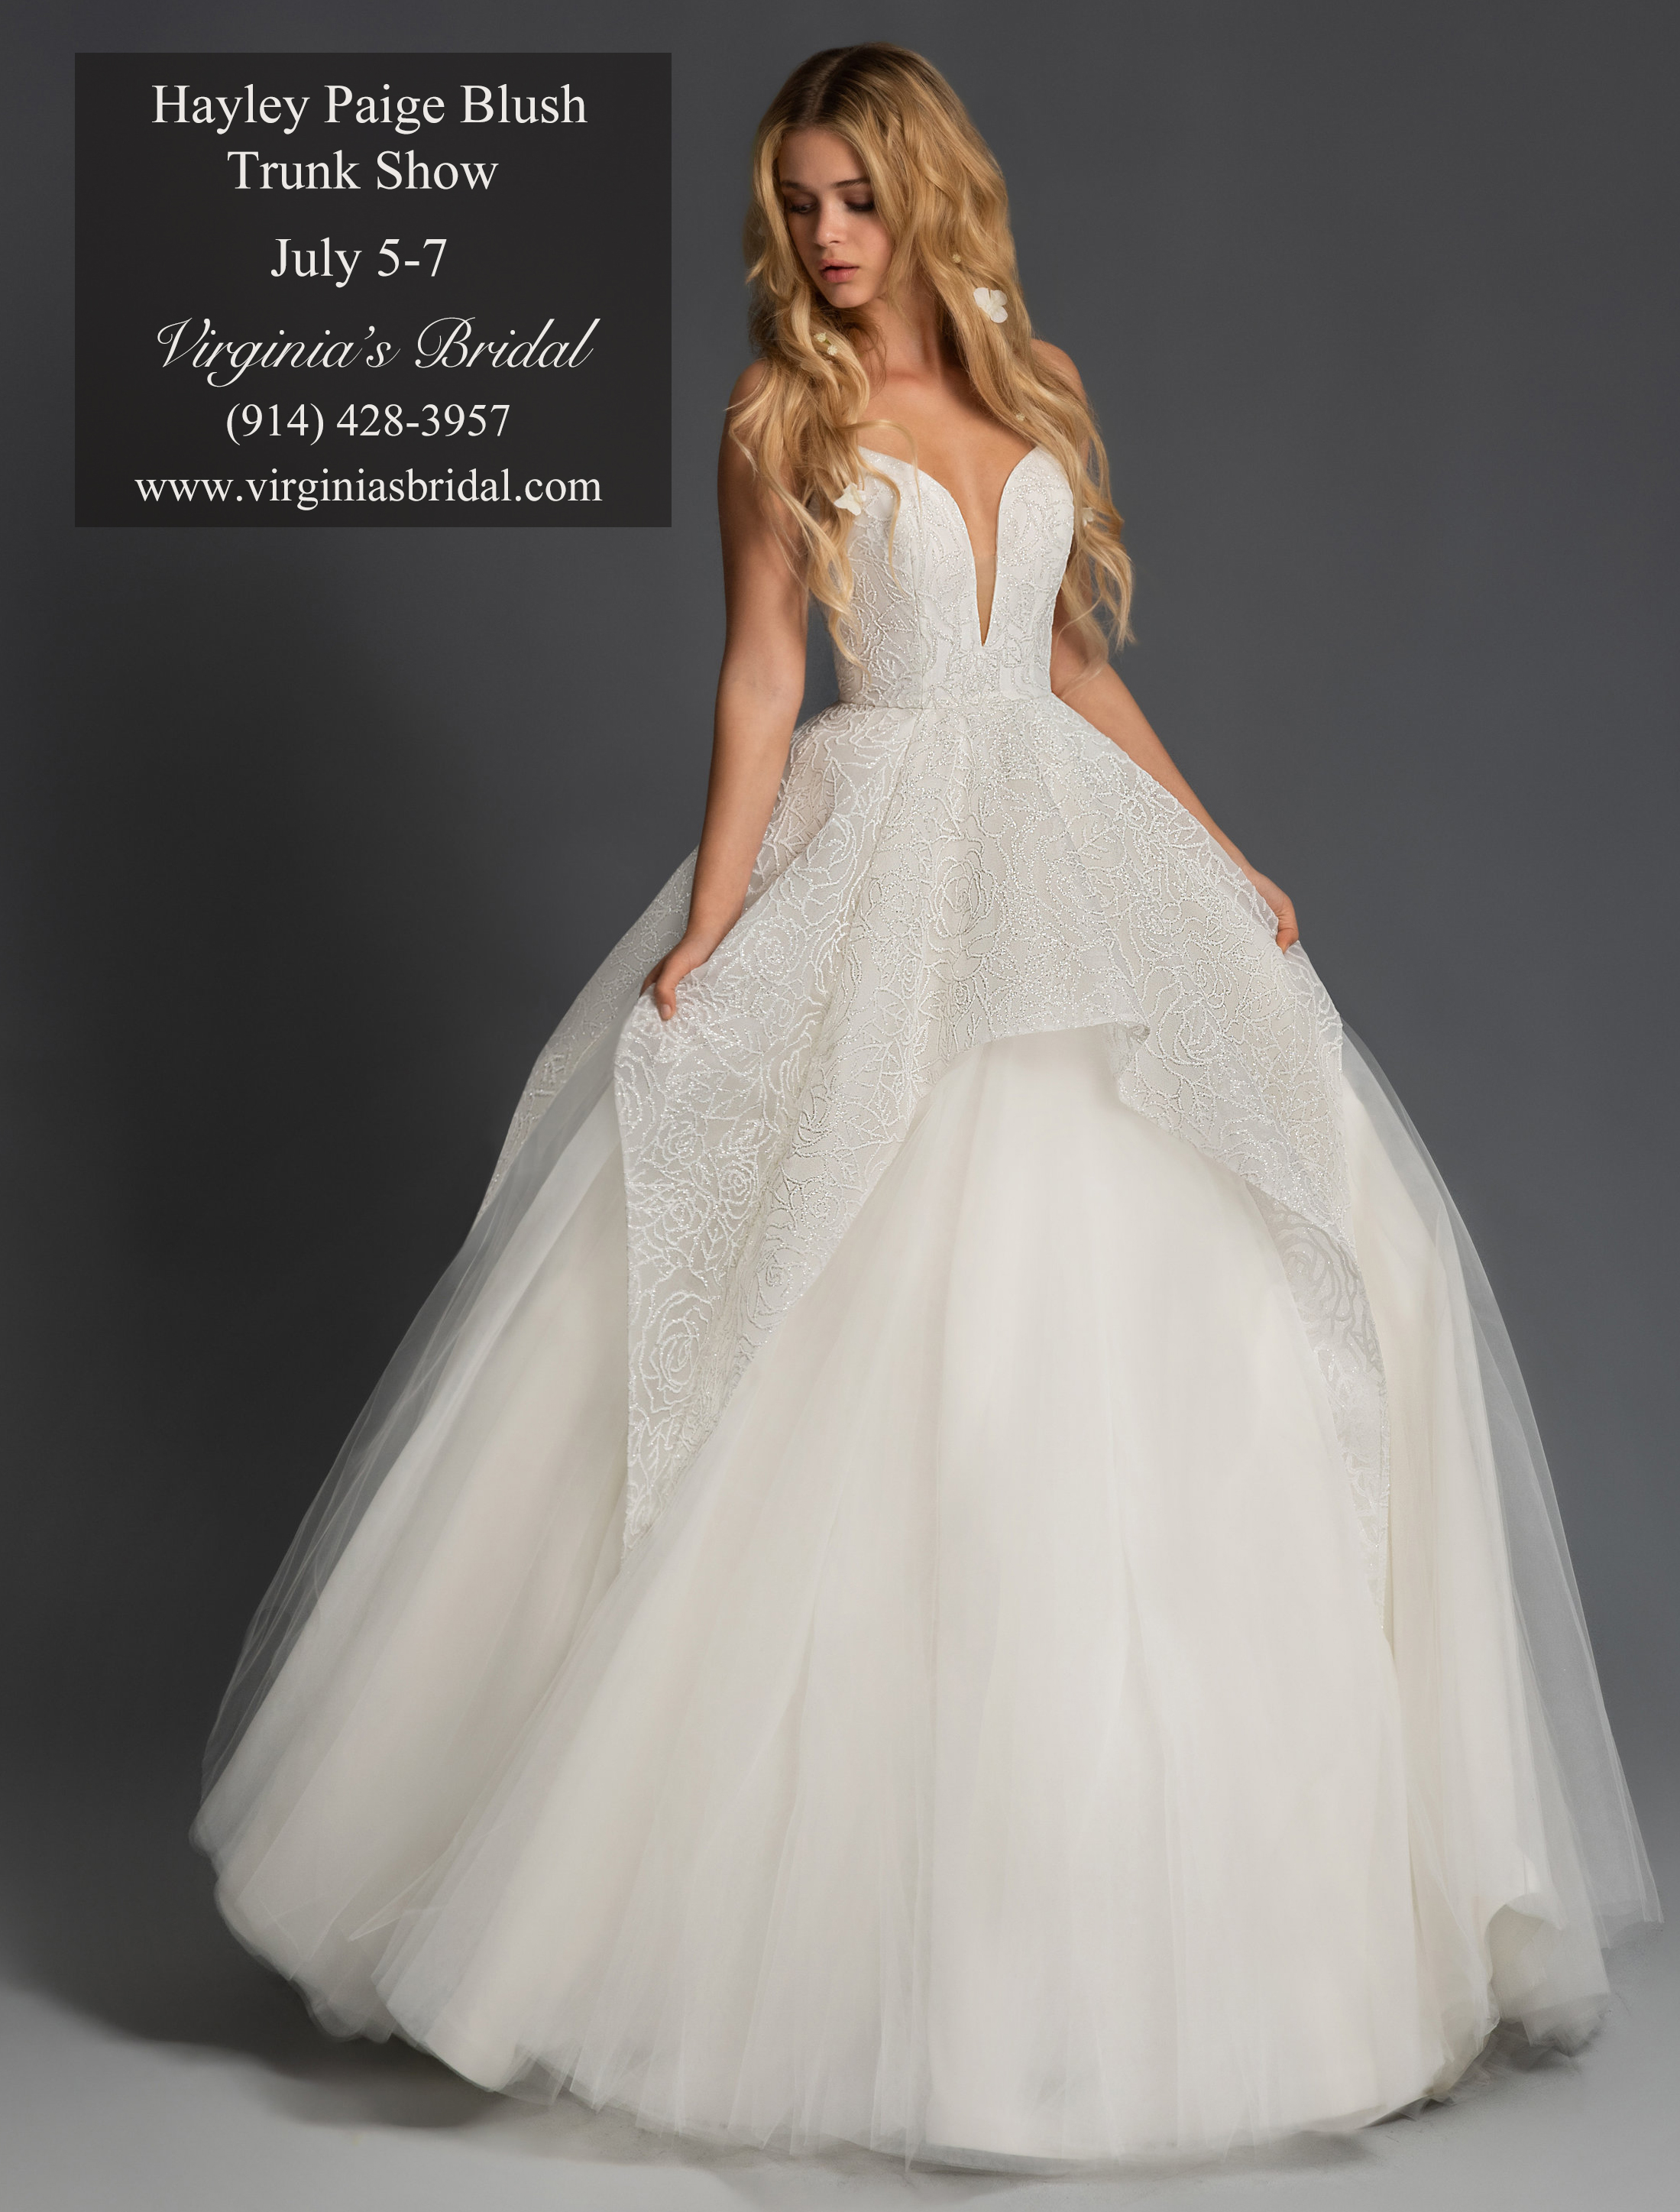 blush-hayley-paige-bridal-fall-2019-style-1959-nahla